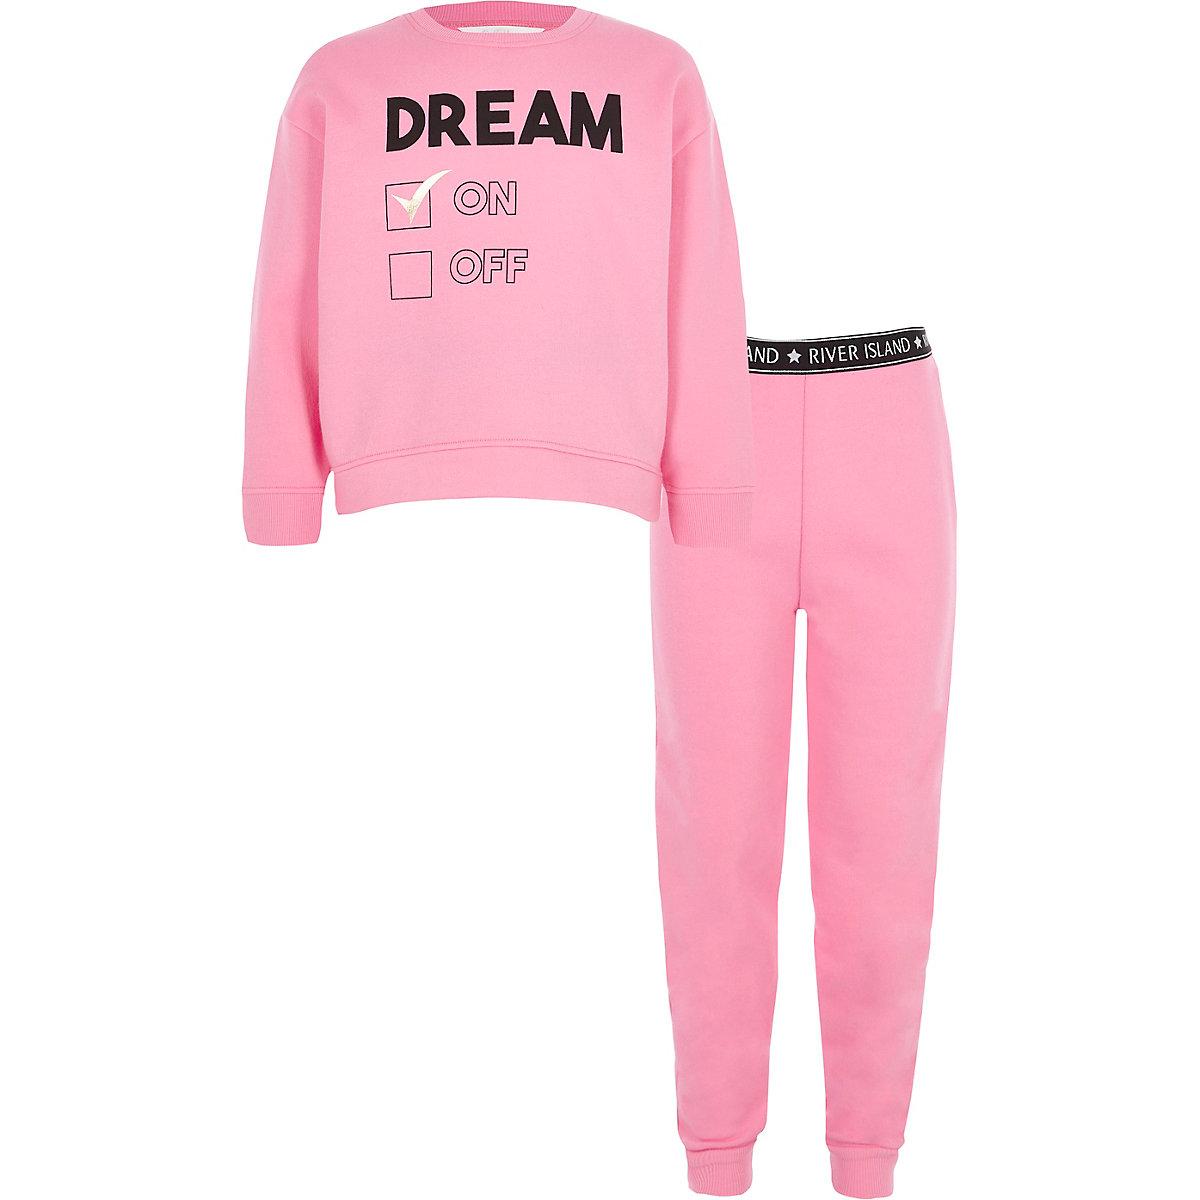 Girls pink 'dream' sweatshirt lounge outfit